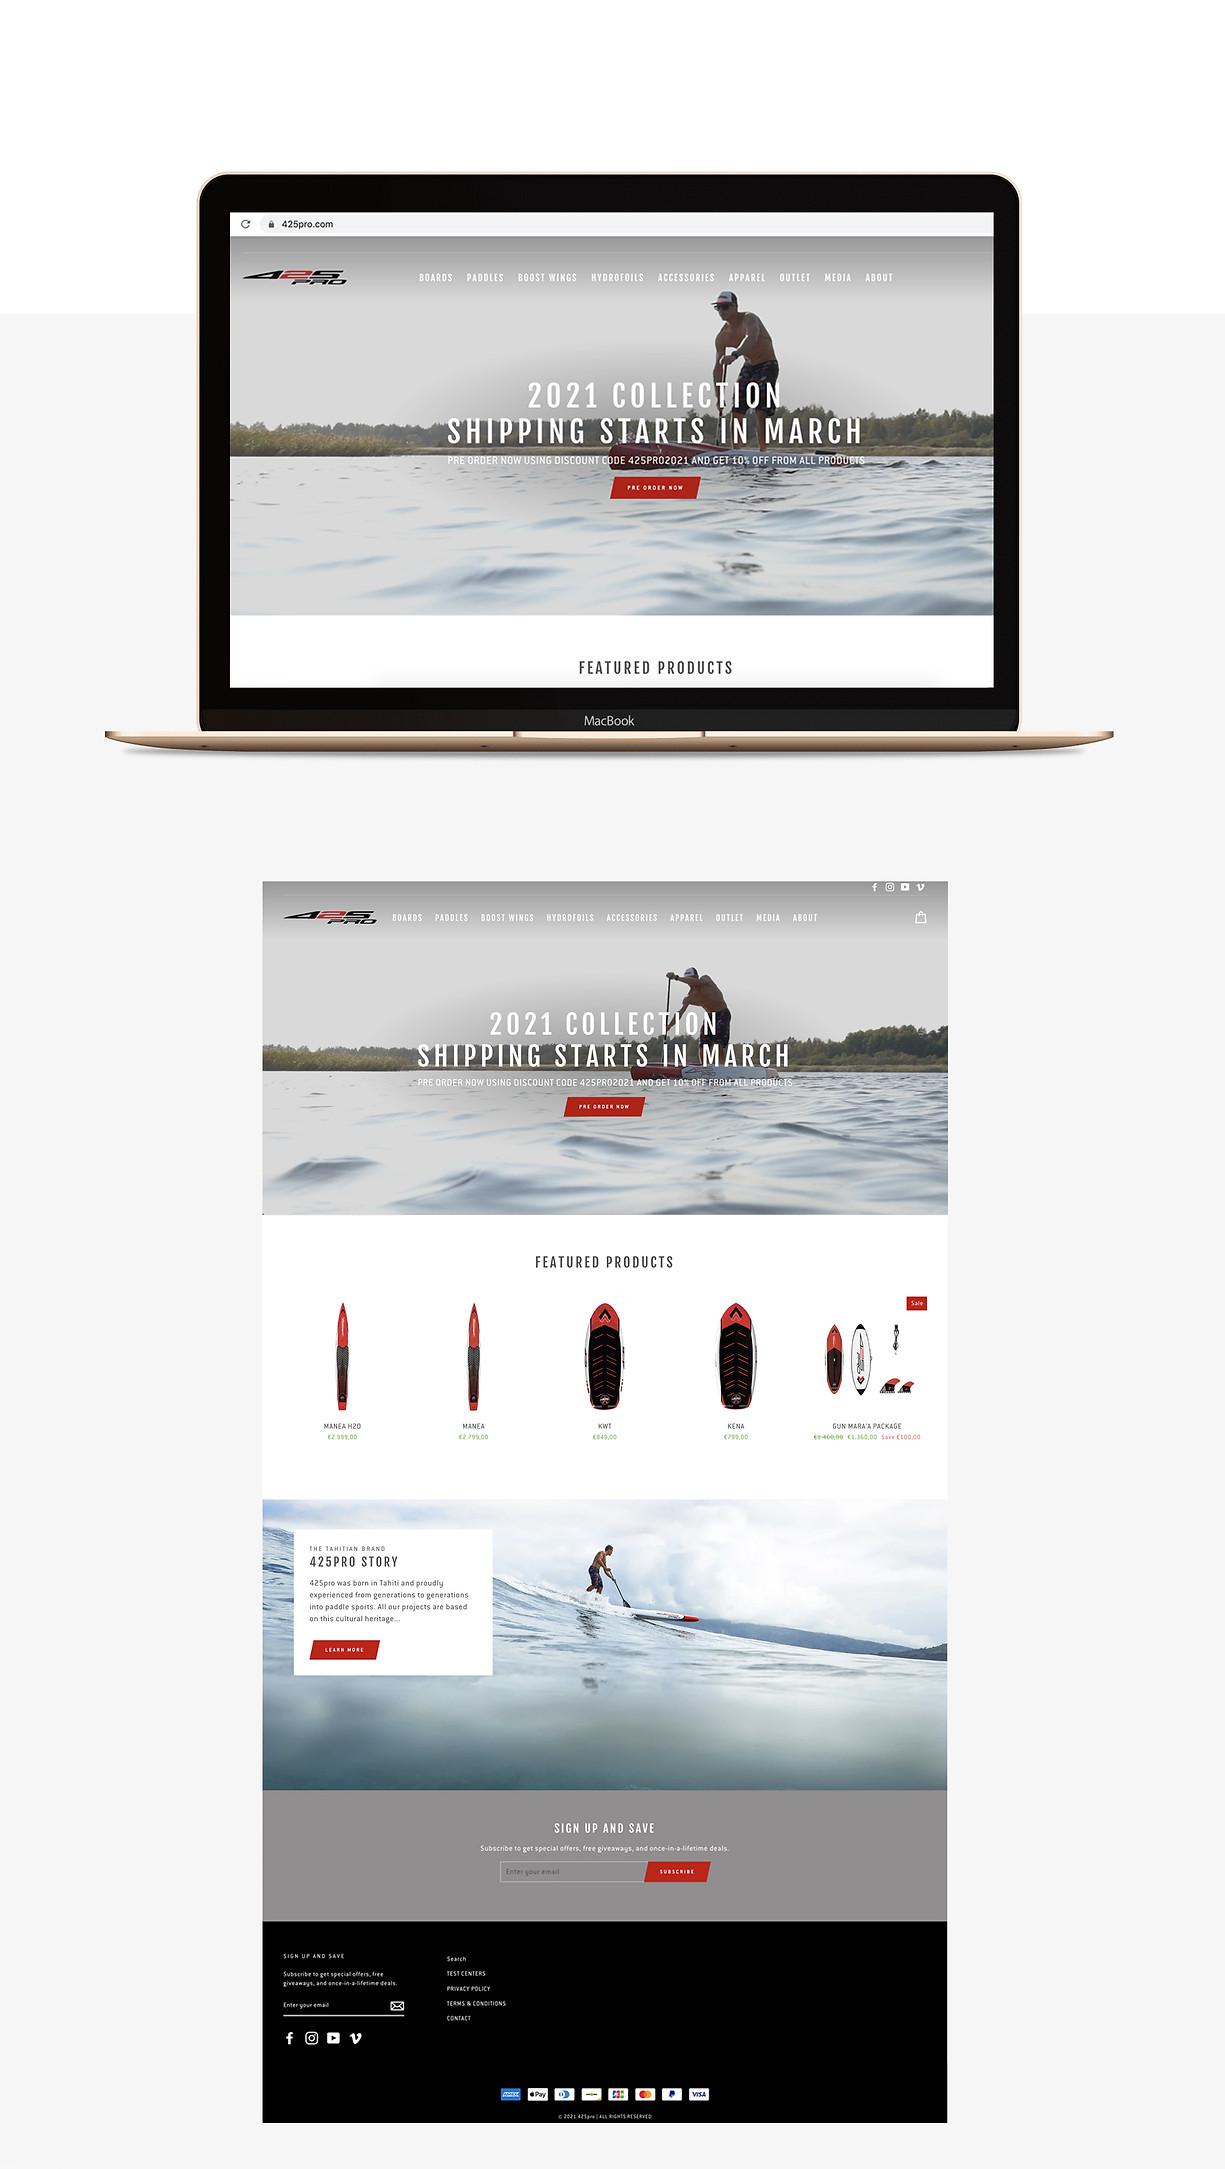 425 pro website.jpg